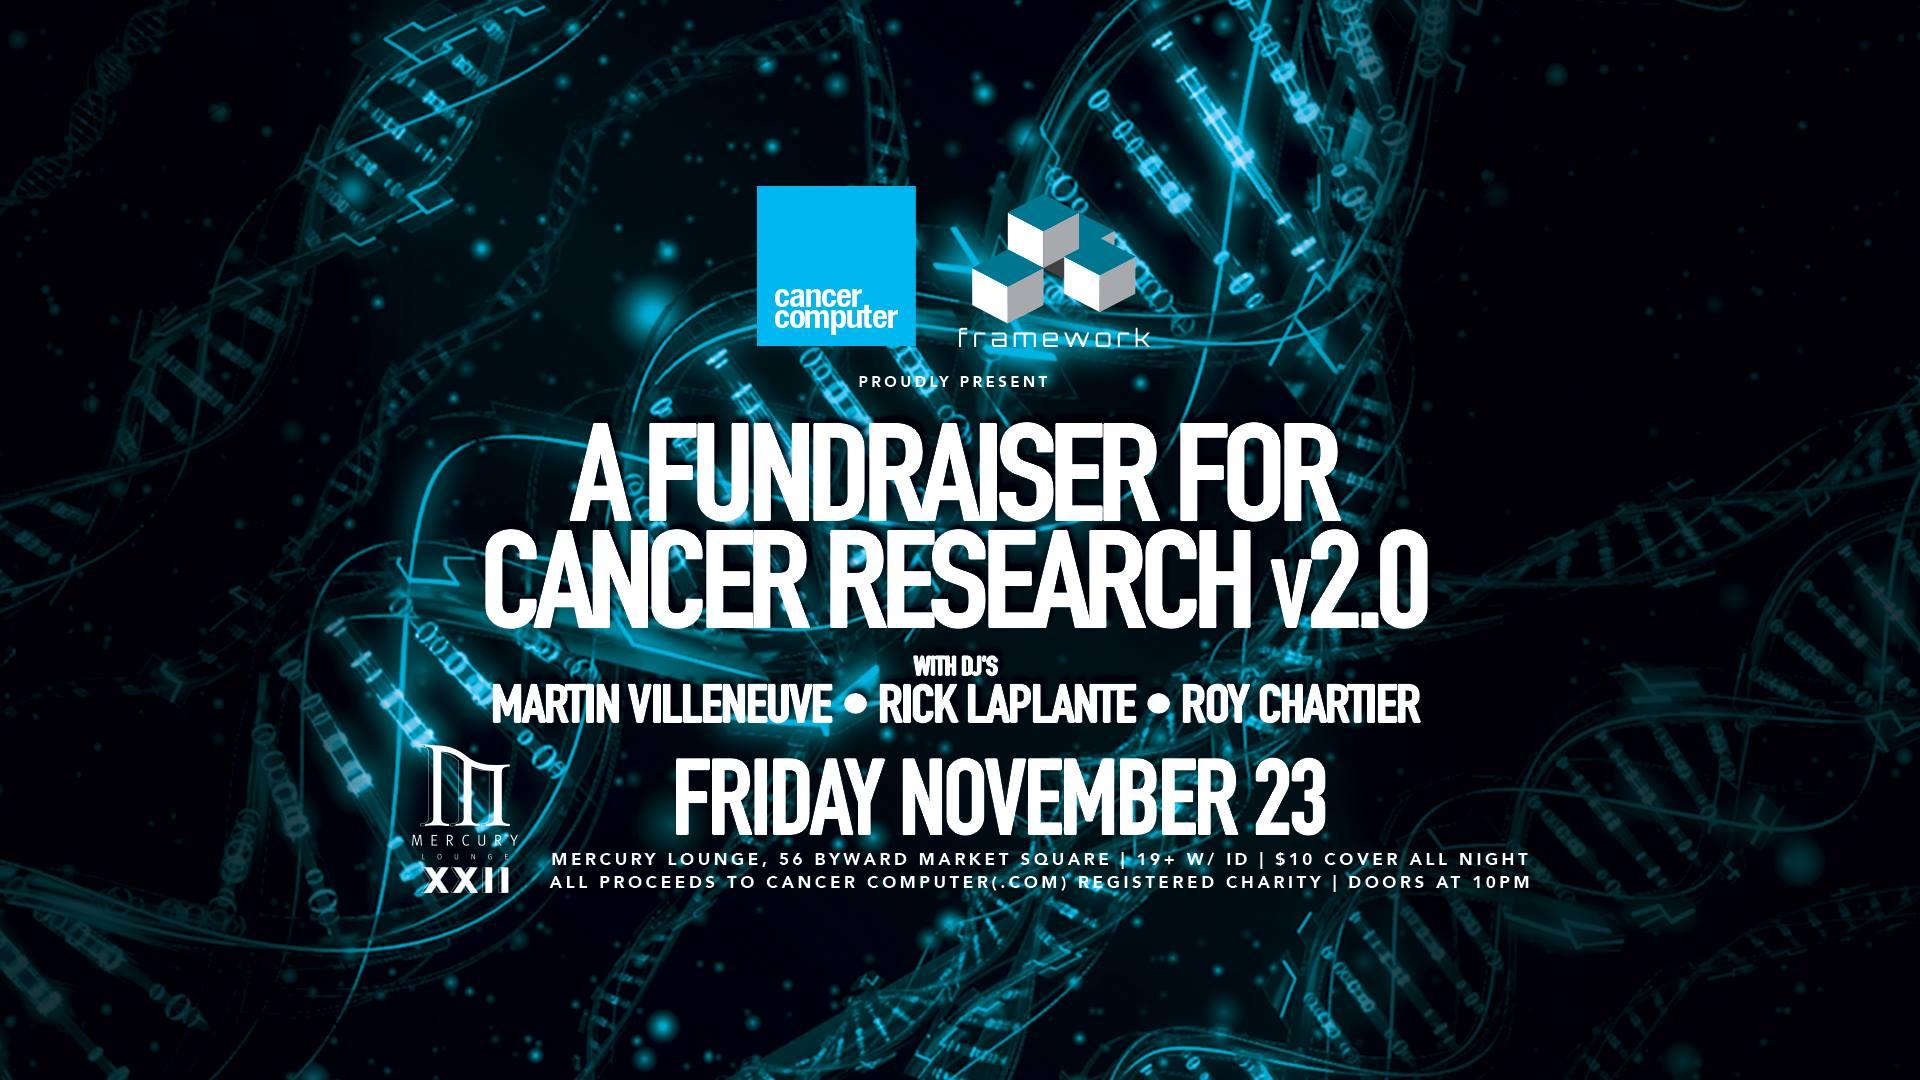 Framework Music Presents: A Fundraiser for Cancer Research v.2.0